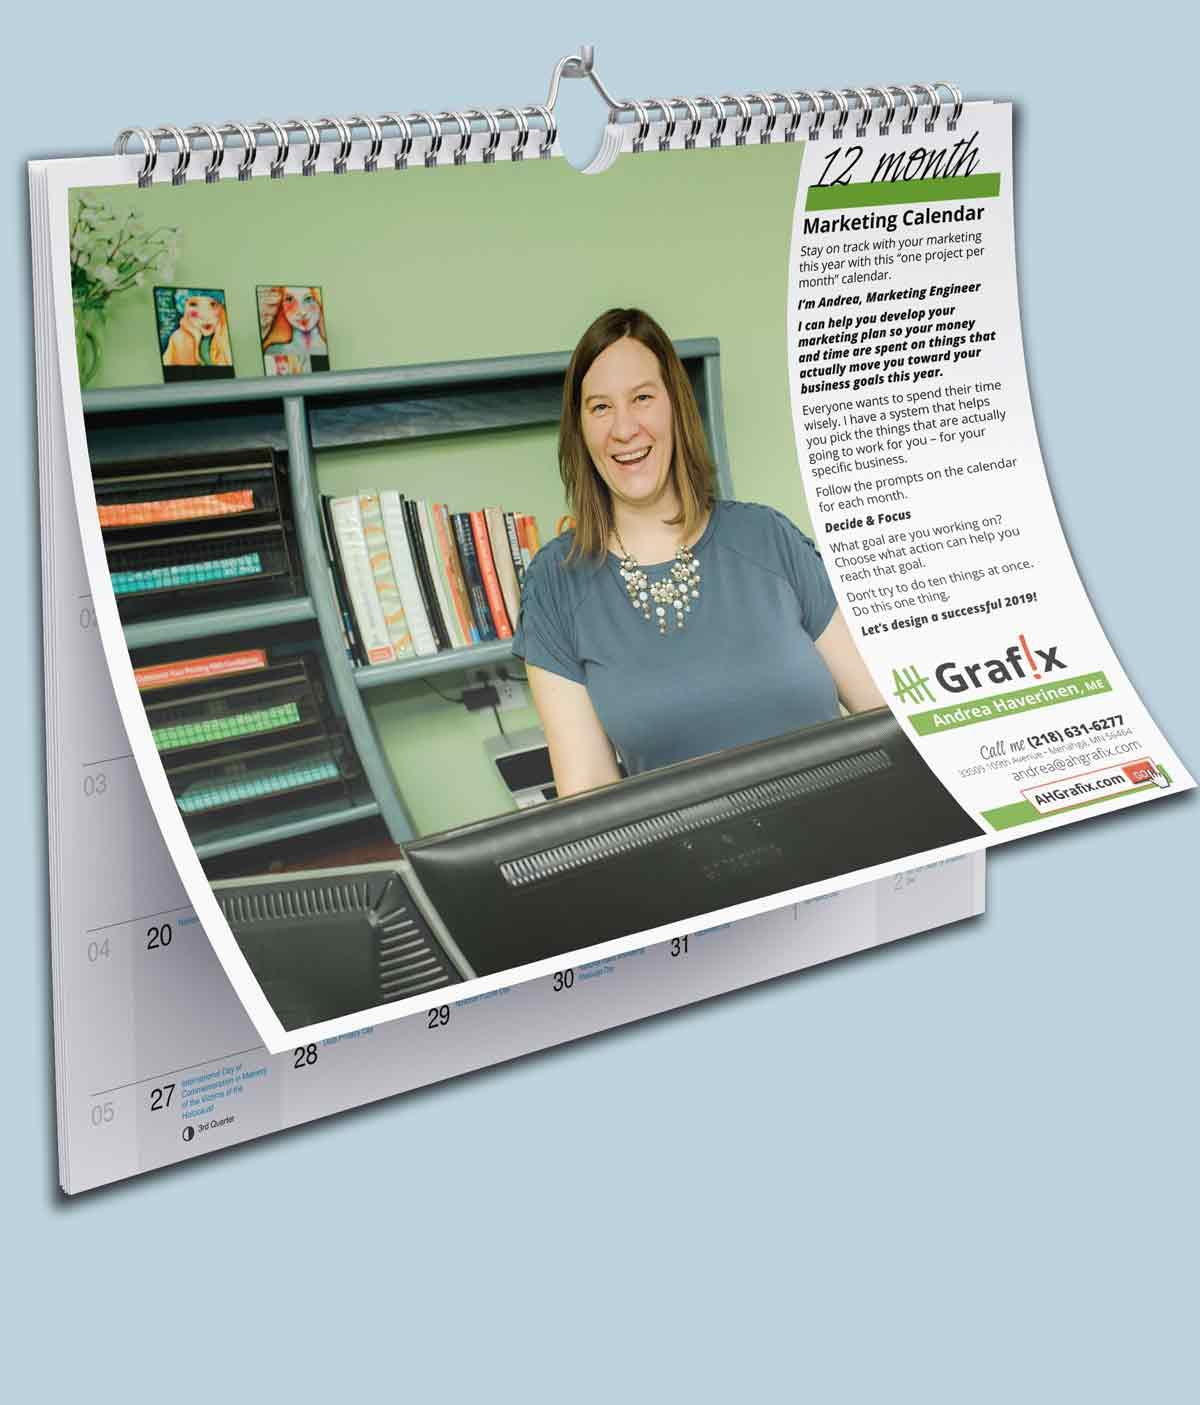 sites/42728166/Mockup-Marketing-Calendar-1200px-blue-bkg.jpg